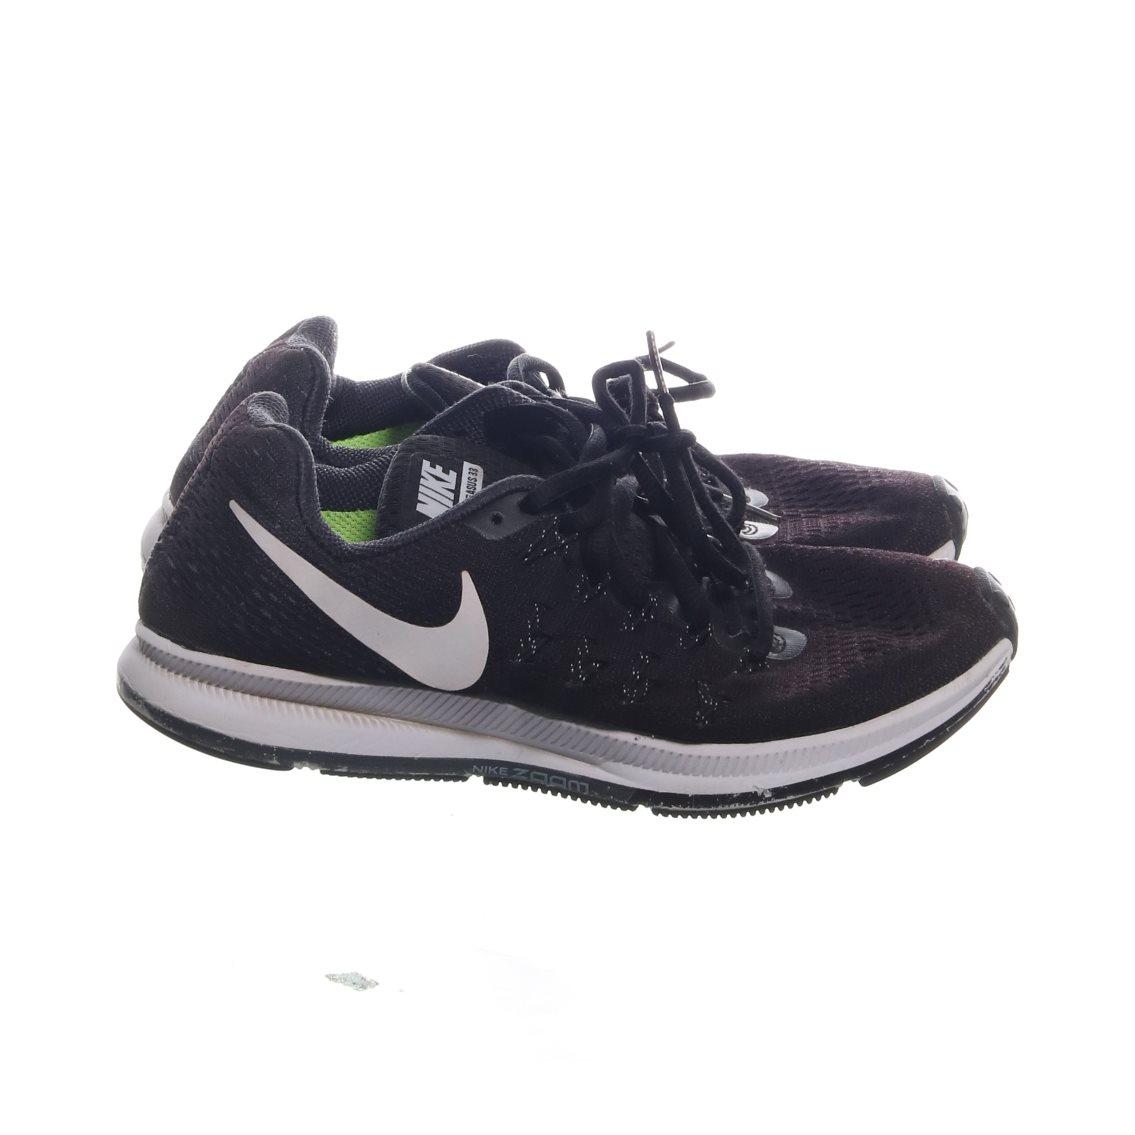 new products 72db3 f26c2 Nike, Träningsskor, Strl  38, Zoom pegasus 33, Svart